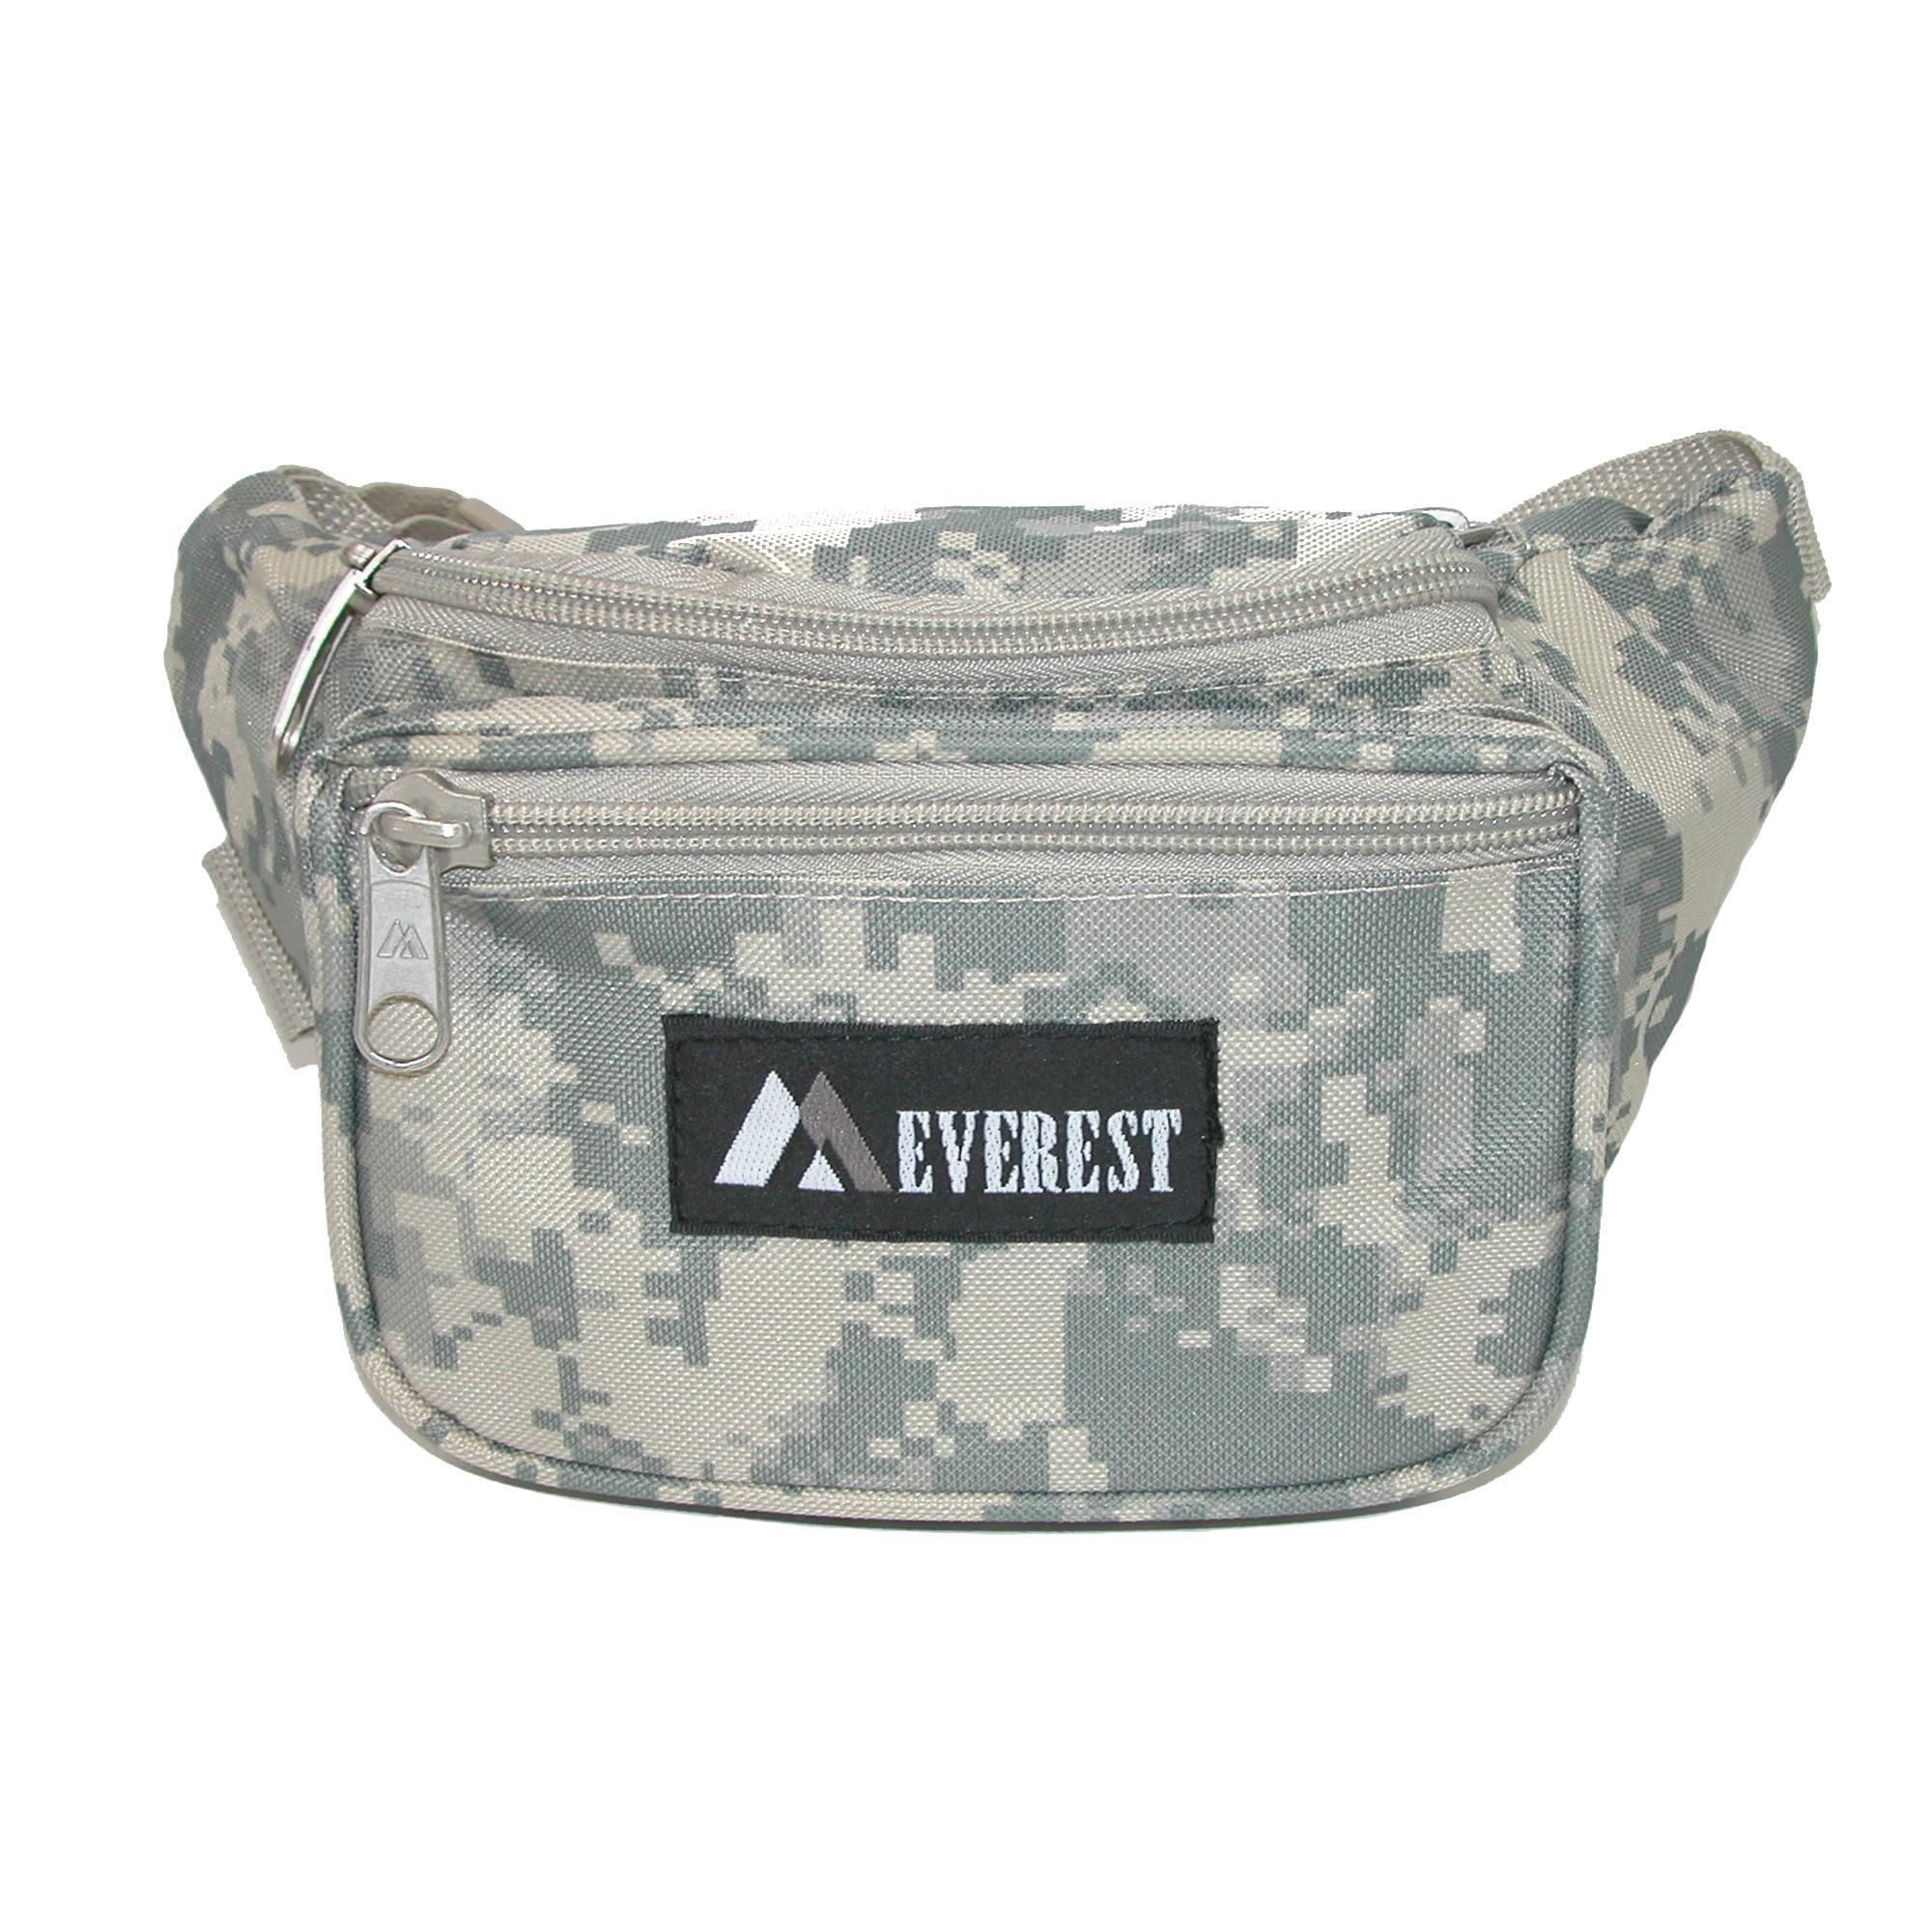 Everest Durable Fabric Waist Packs (Case of 50), Digital Camo